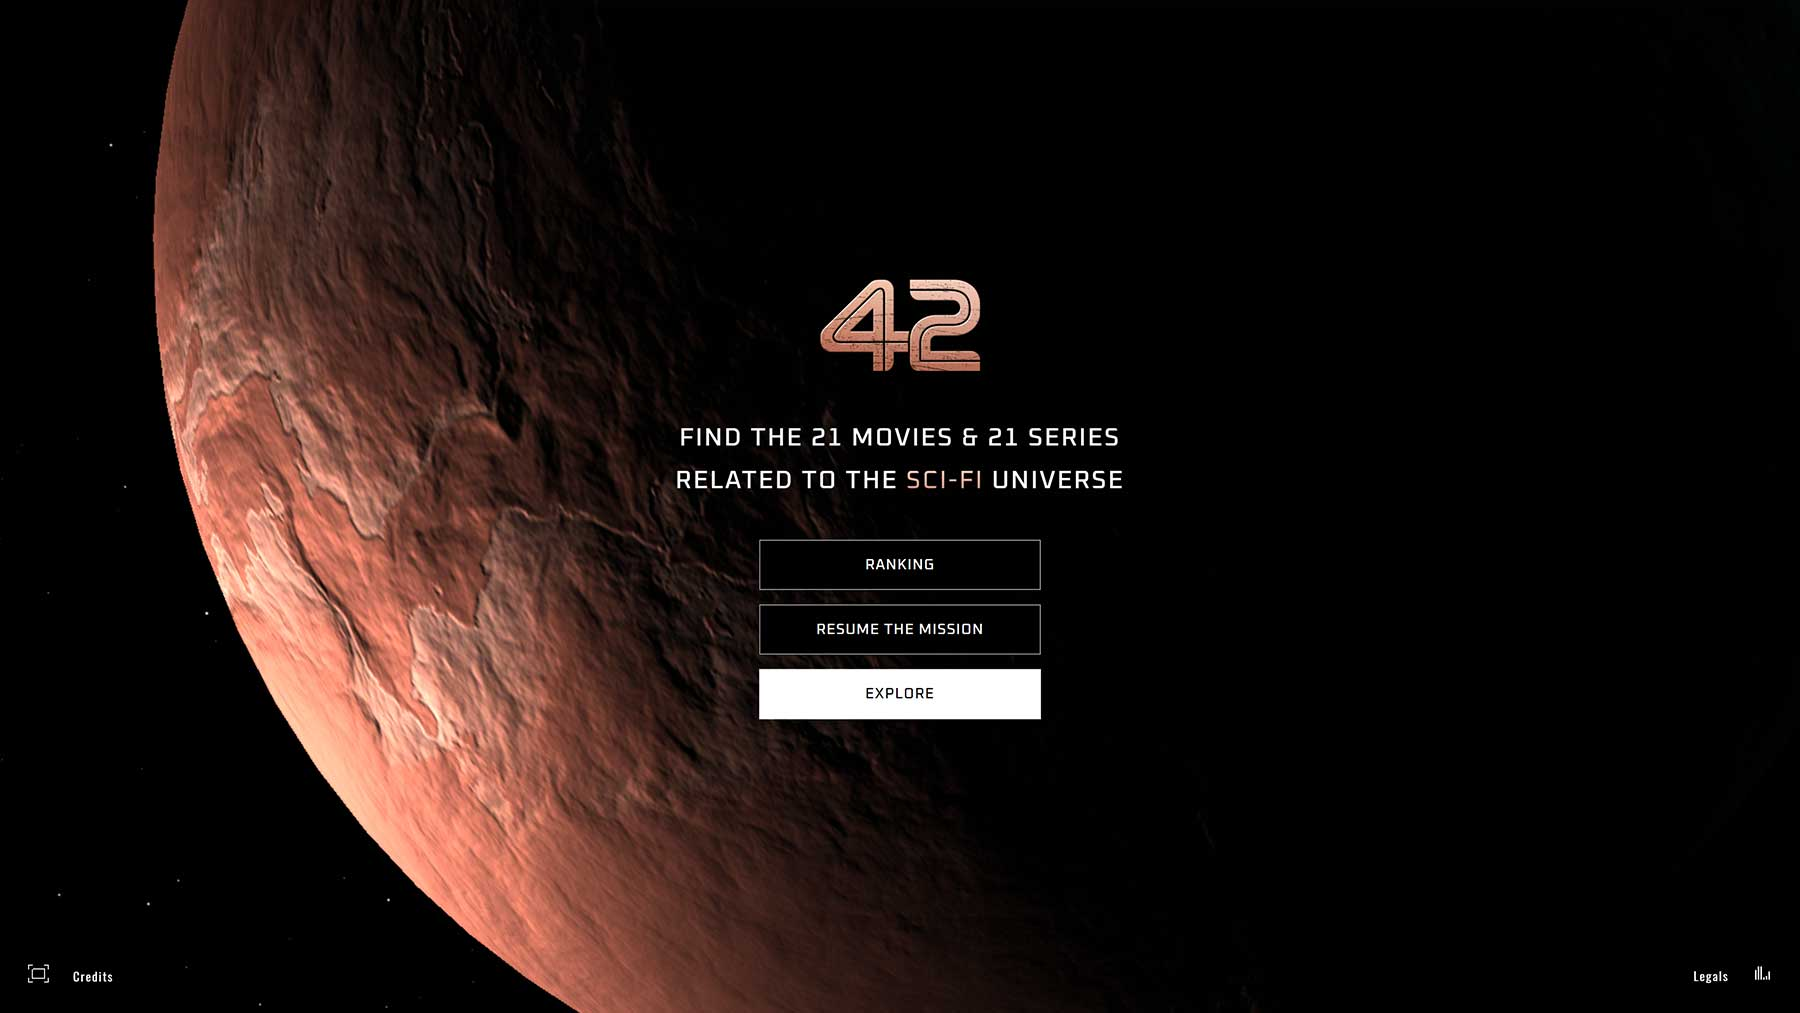 PopCorn SyFy: 42 im Bild versteckte Sci-Fi-Filme & -Serien popcorn-66-syfy-versteckte-filme-und-serien_2